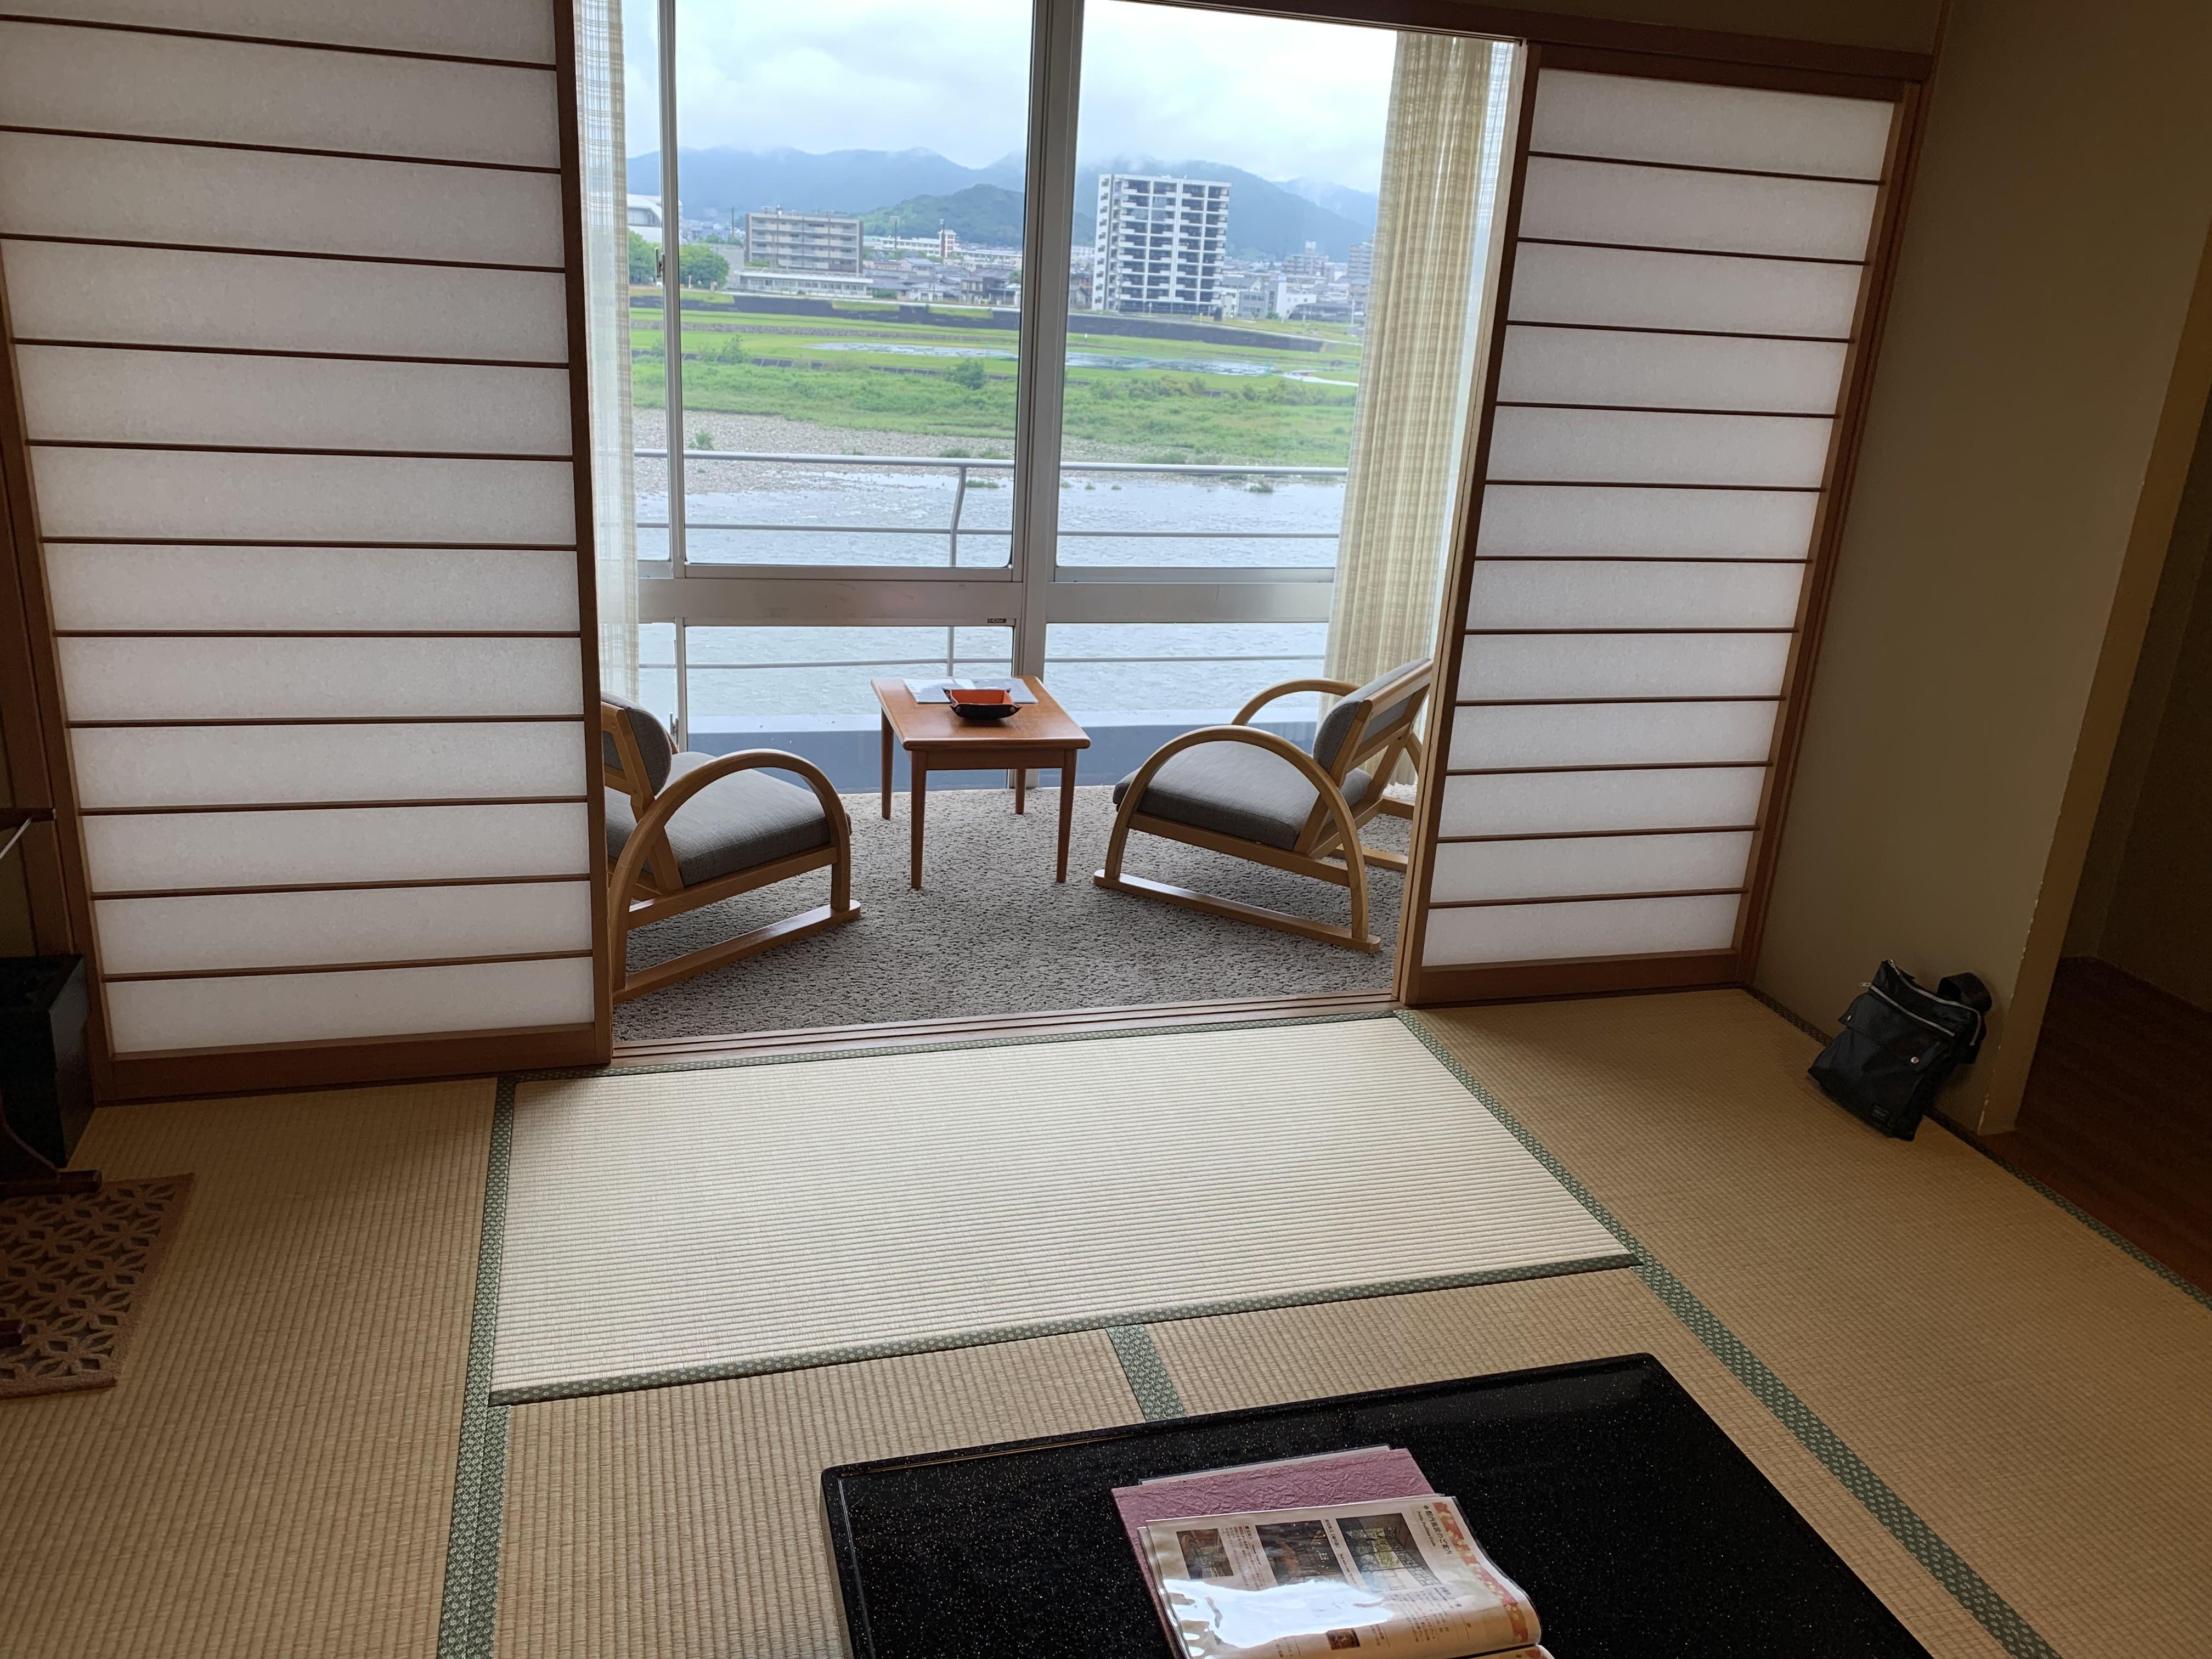 長良川温泉の旅館十八楼の部屋